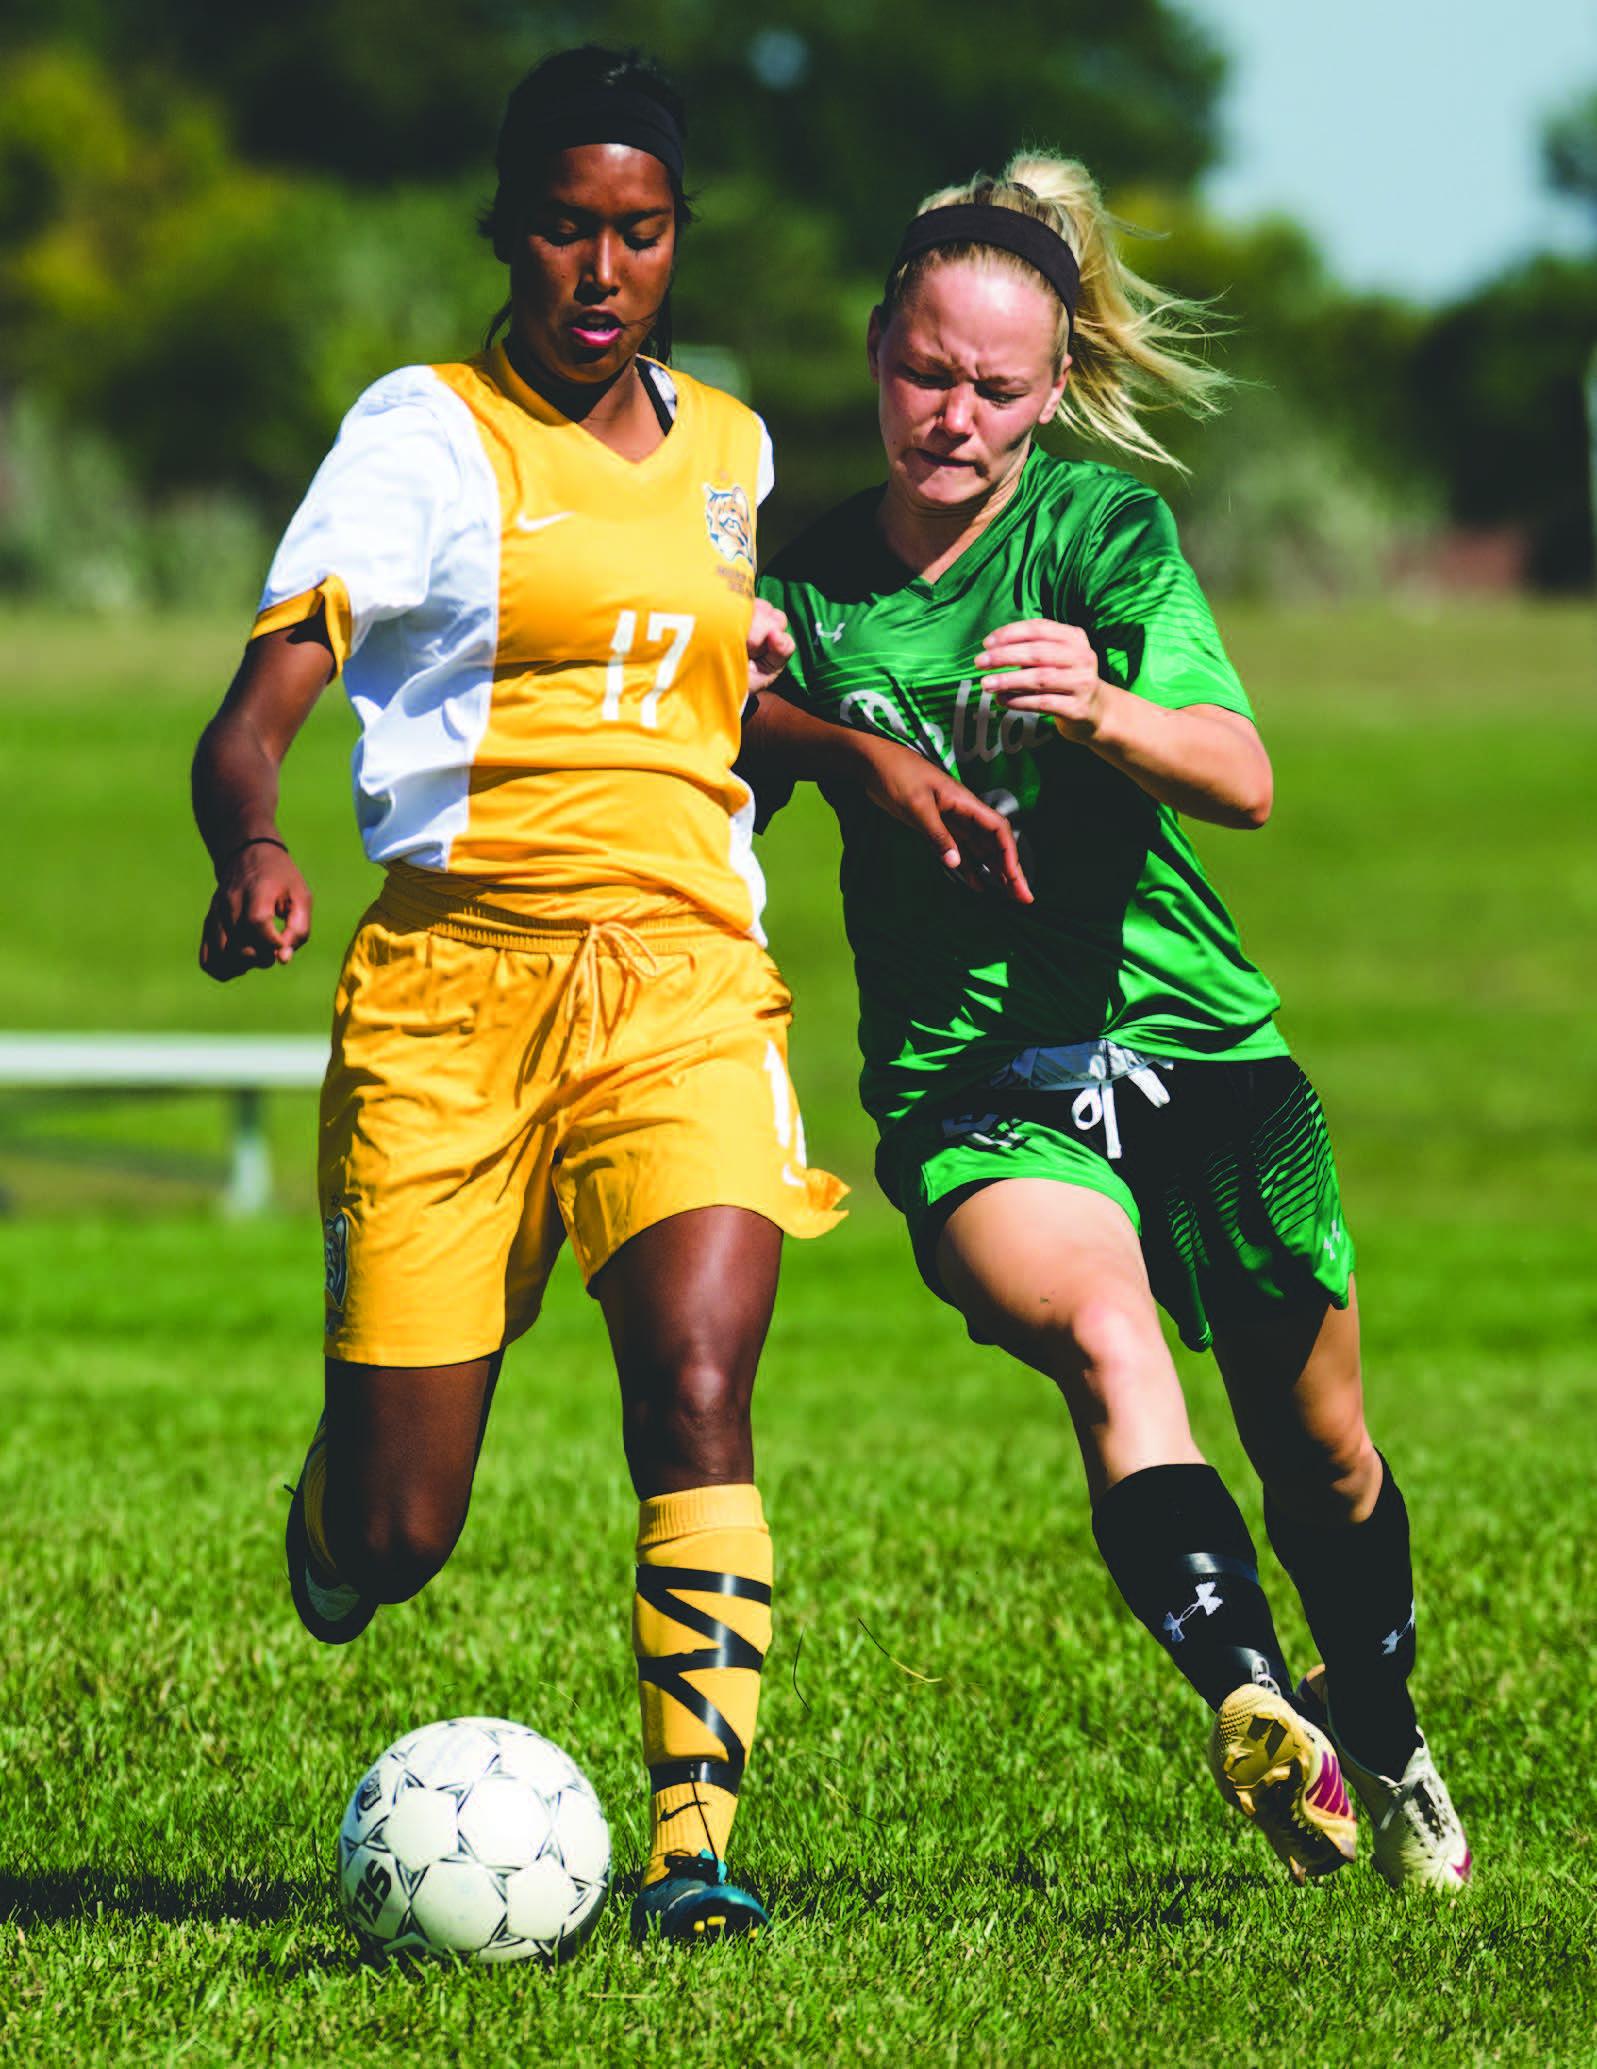 IMAGES BY JAKE MULKA | PHOTO EDITOR Sophomore Forward Cienna Rael-Whitsitt (17) battles a Delta defender for possession of the ball on Sept. 23.